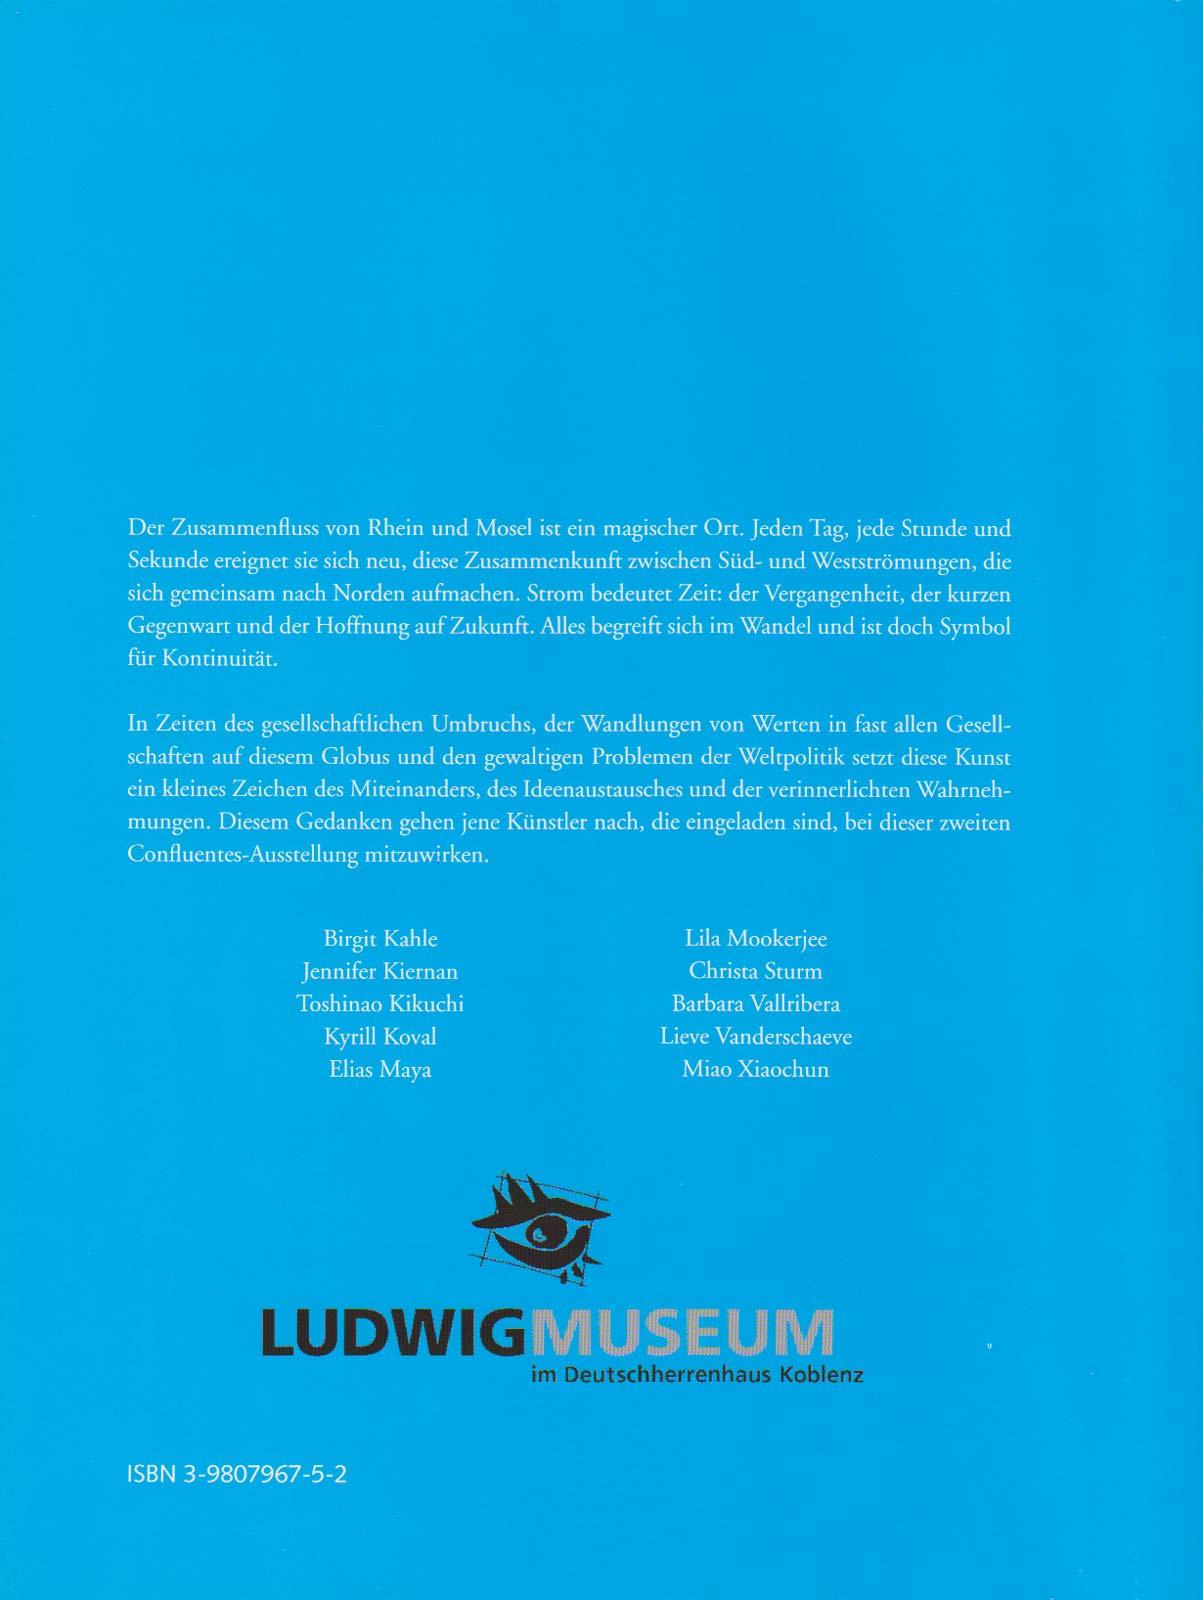 Ludwig-Museum-2